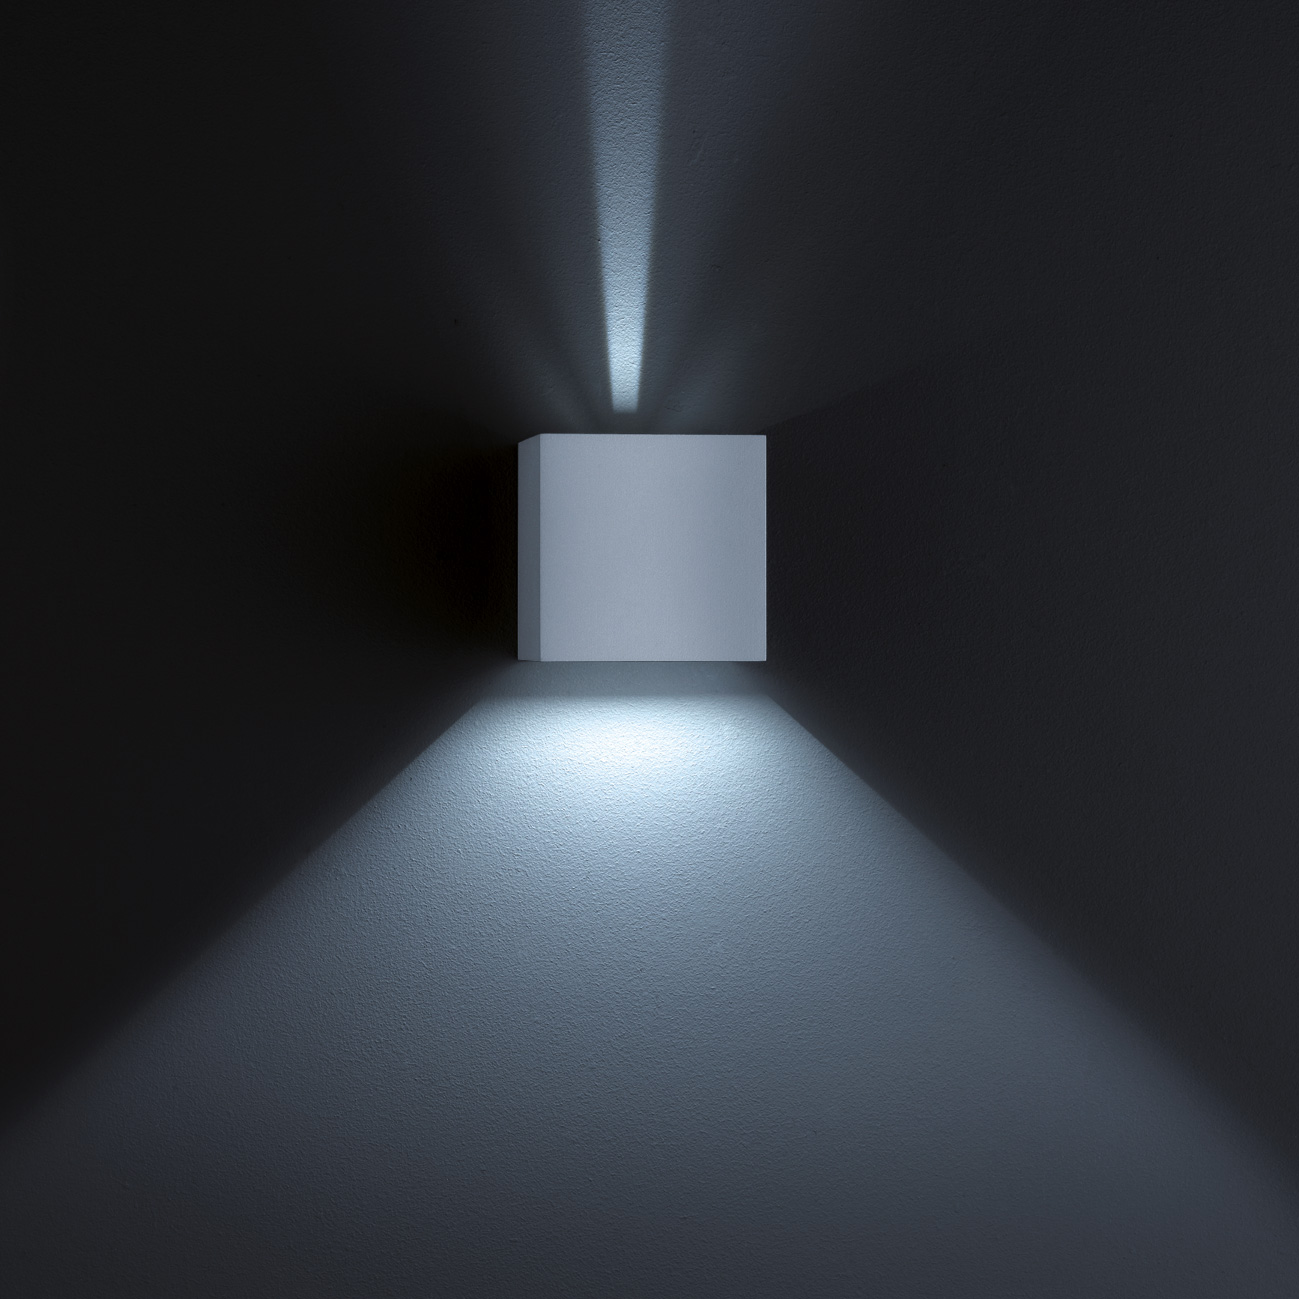 helestra siri 44 led wandleuchte lichtaustritt. Black Bedroom Furniture Sets. Home Design Ideas